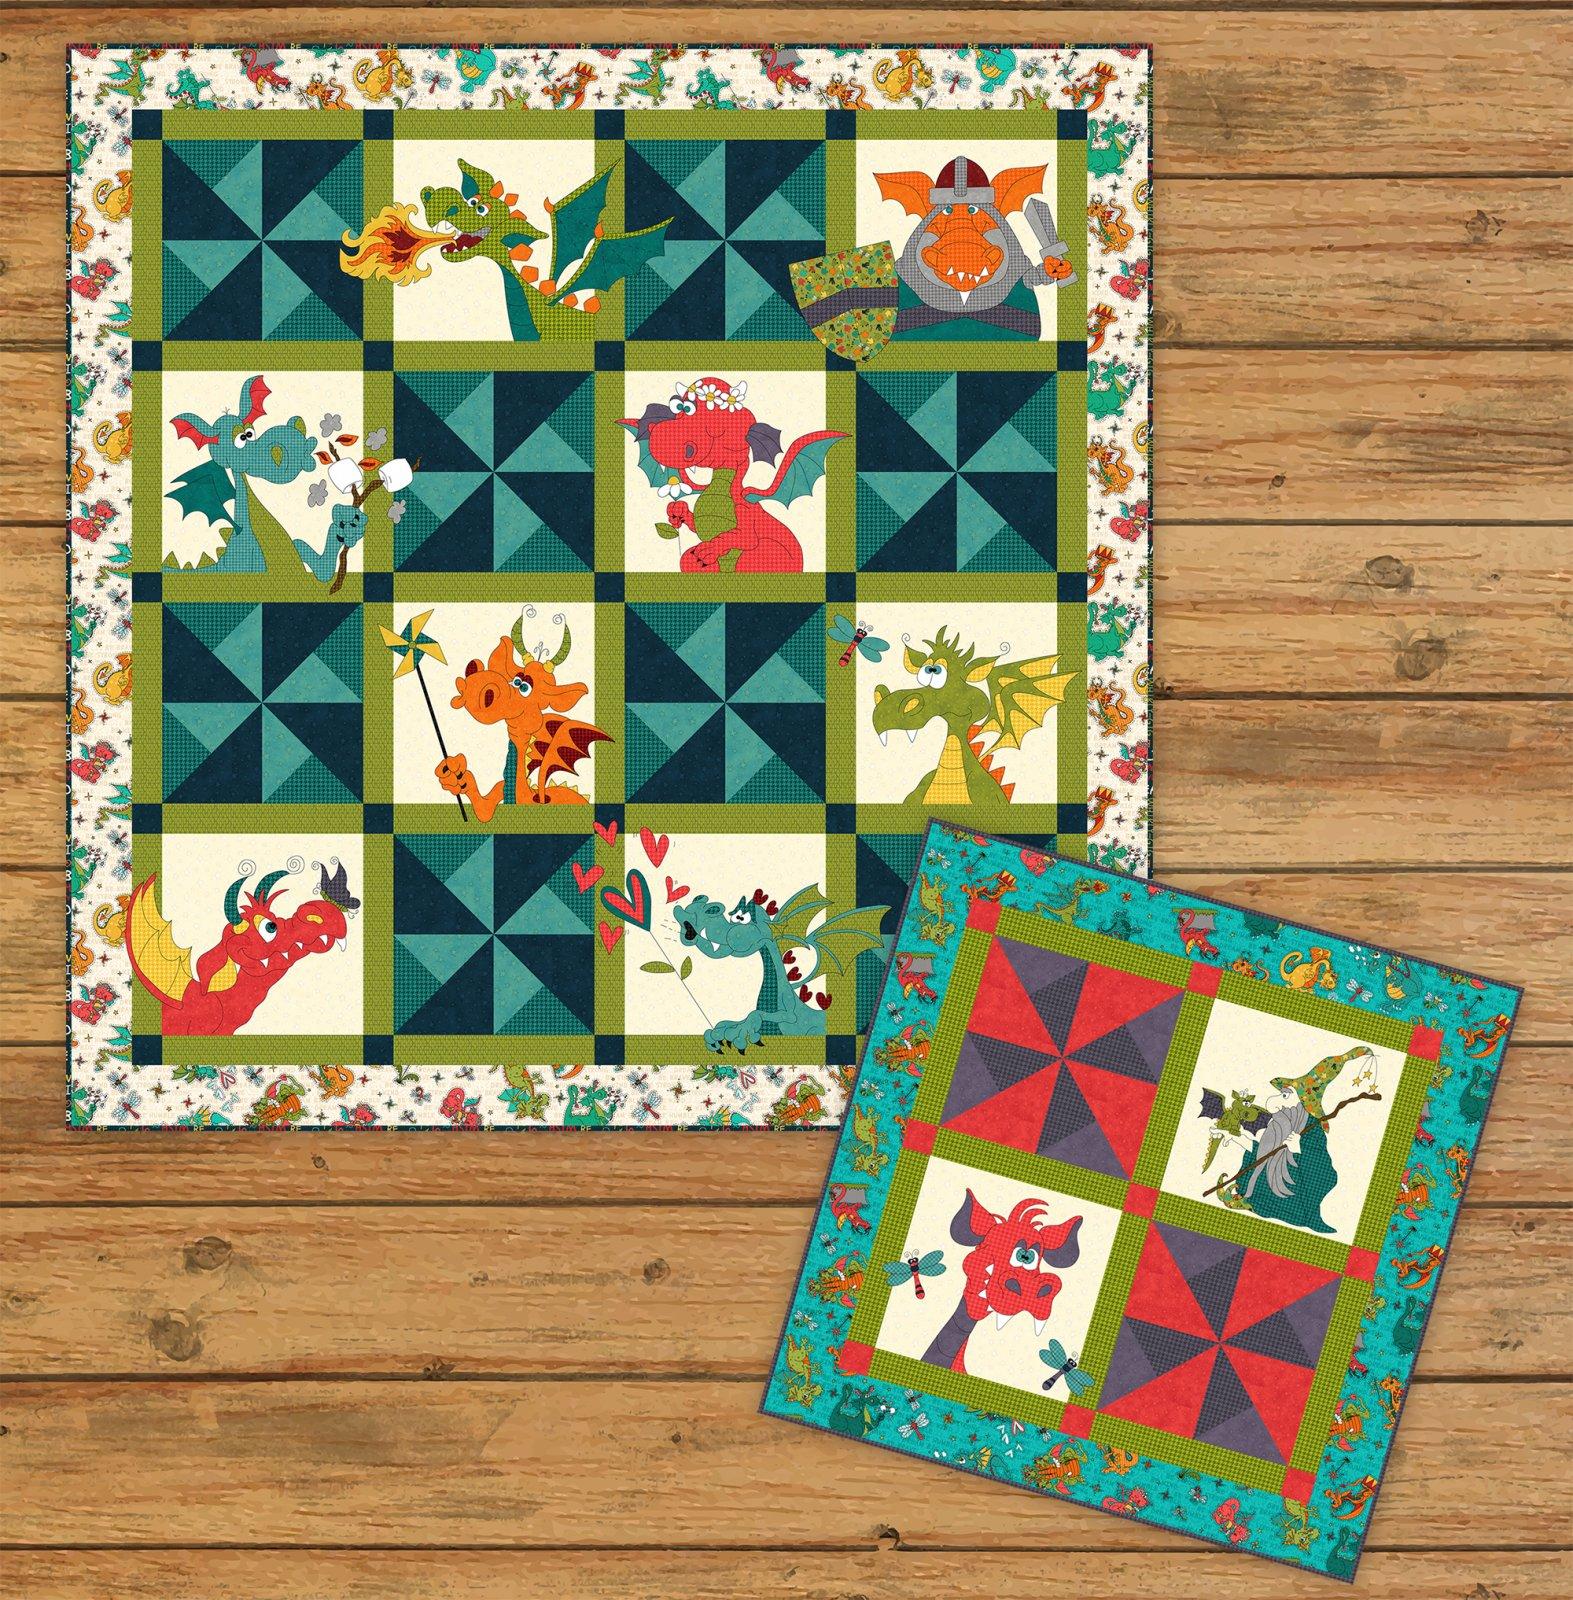 Dragon Applique Quilt & Table Topper Pattern